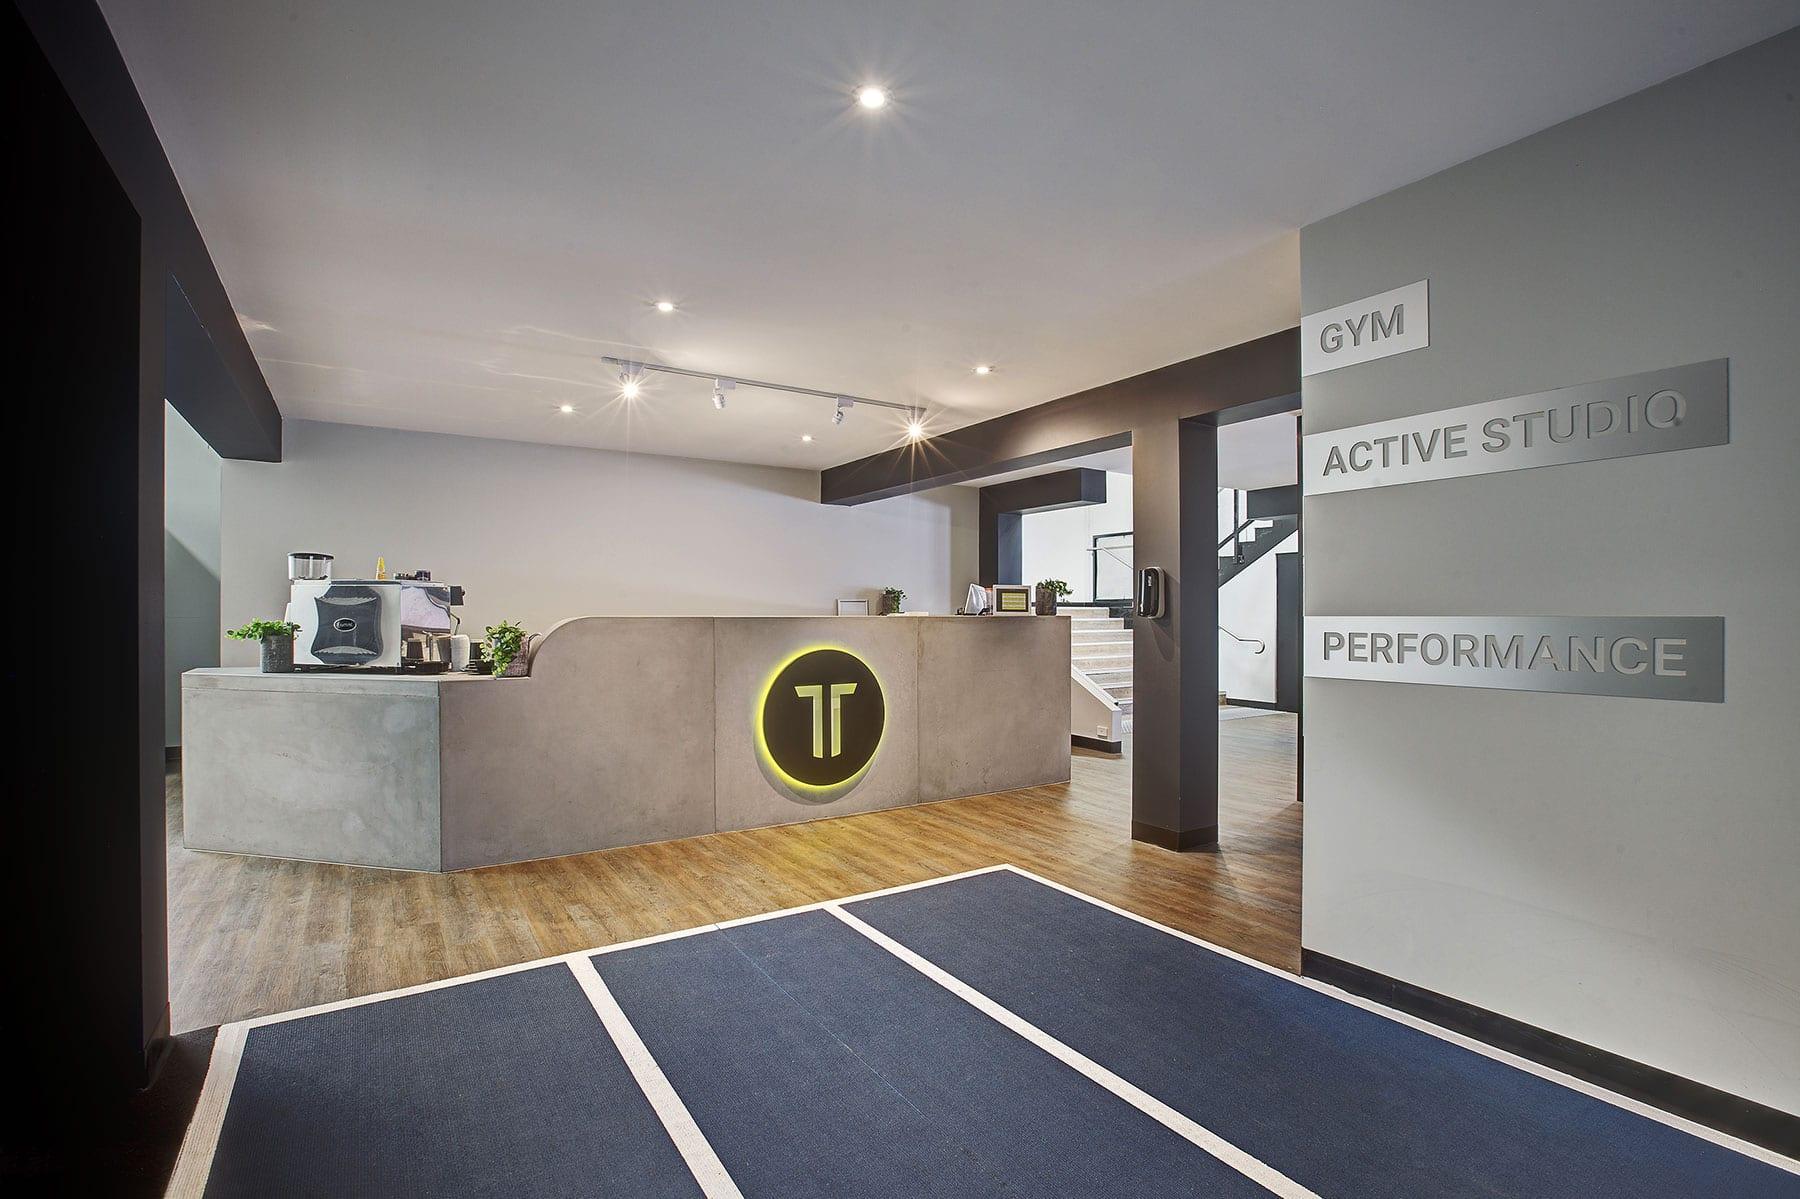 Concrete Reception Desk and Fascia at Tempus Gym by Concrete Studio